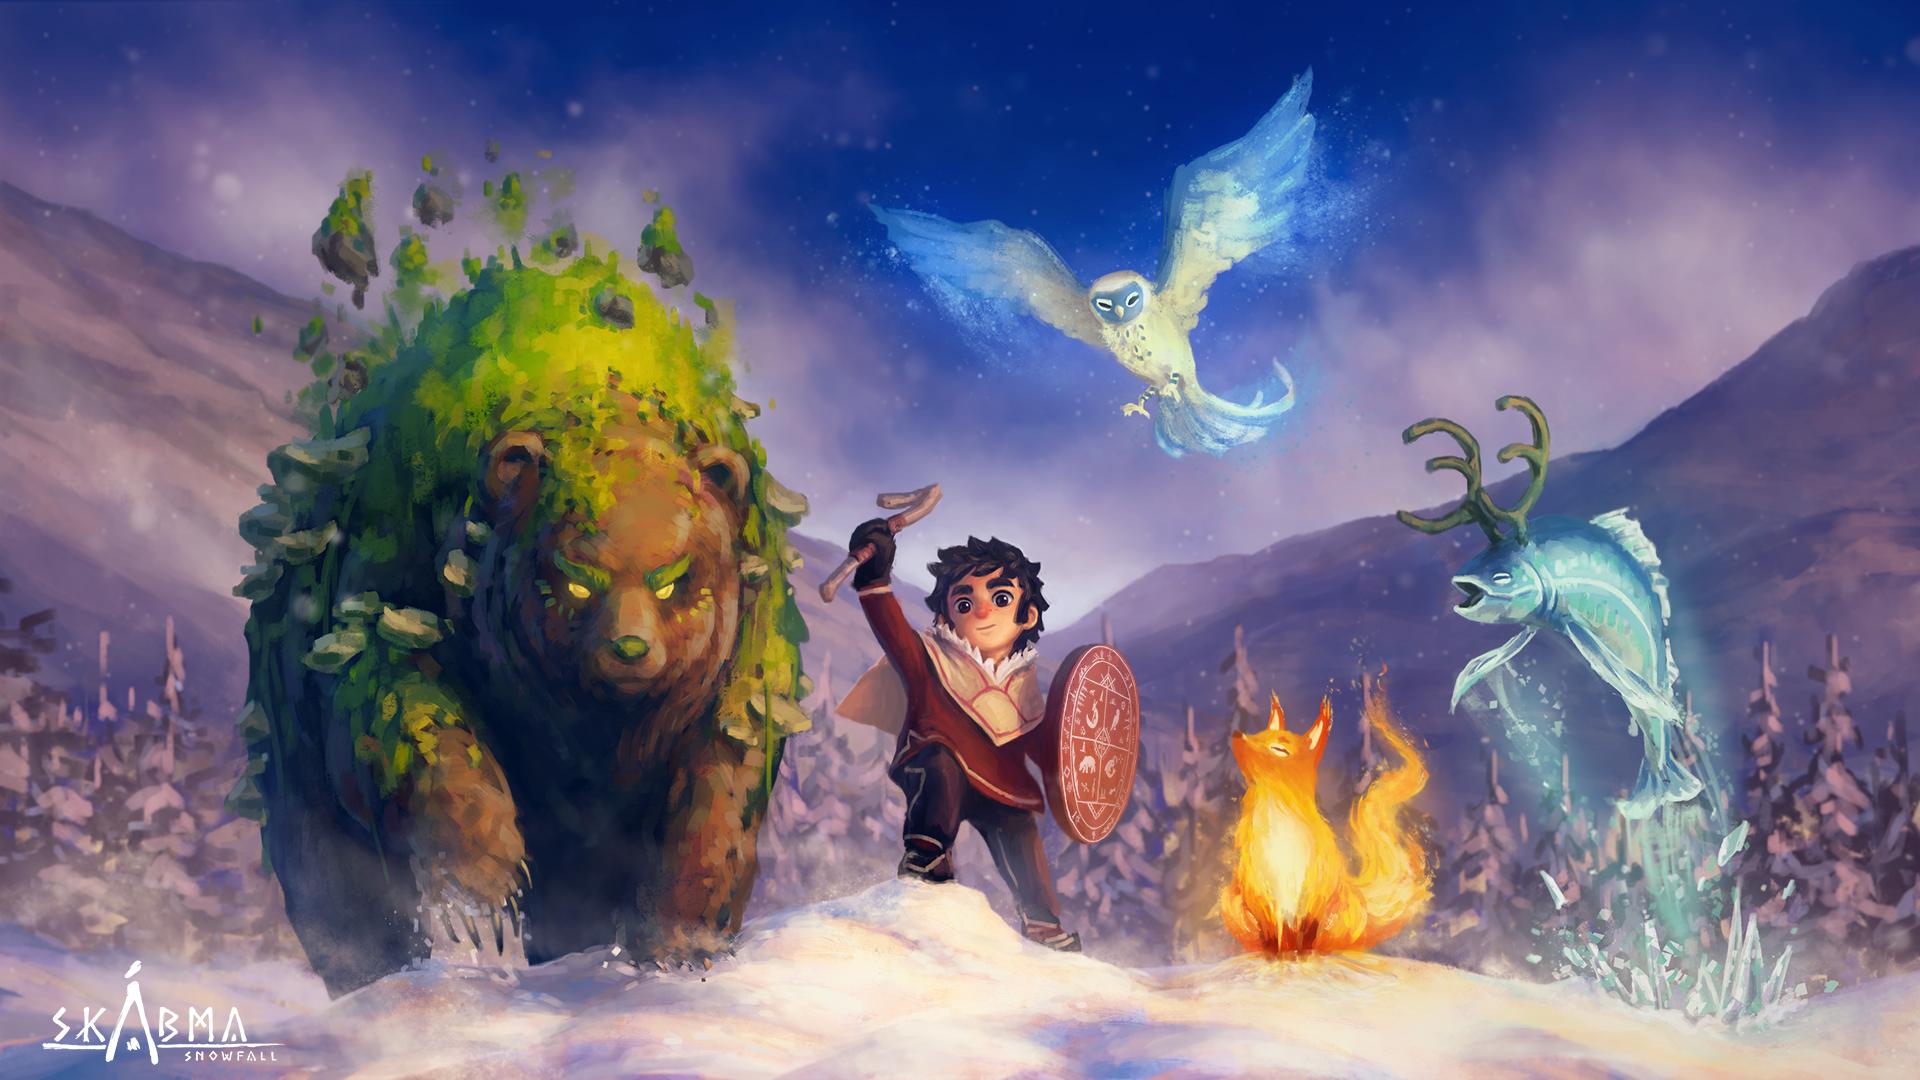 Skabma Snowfall heros